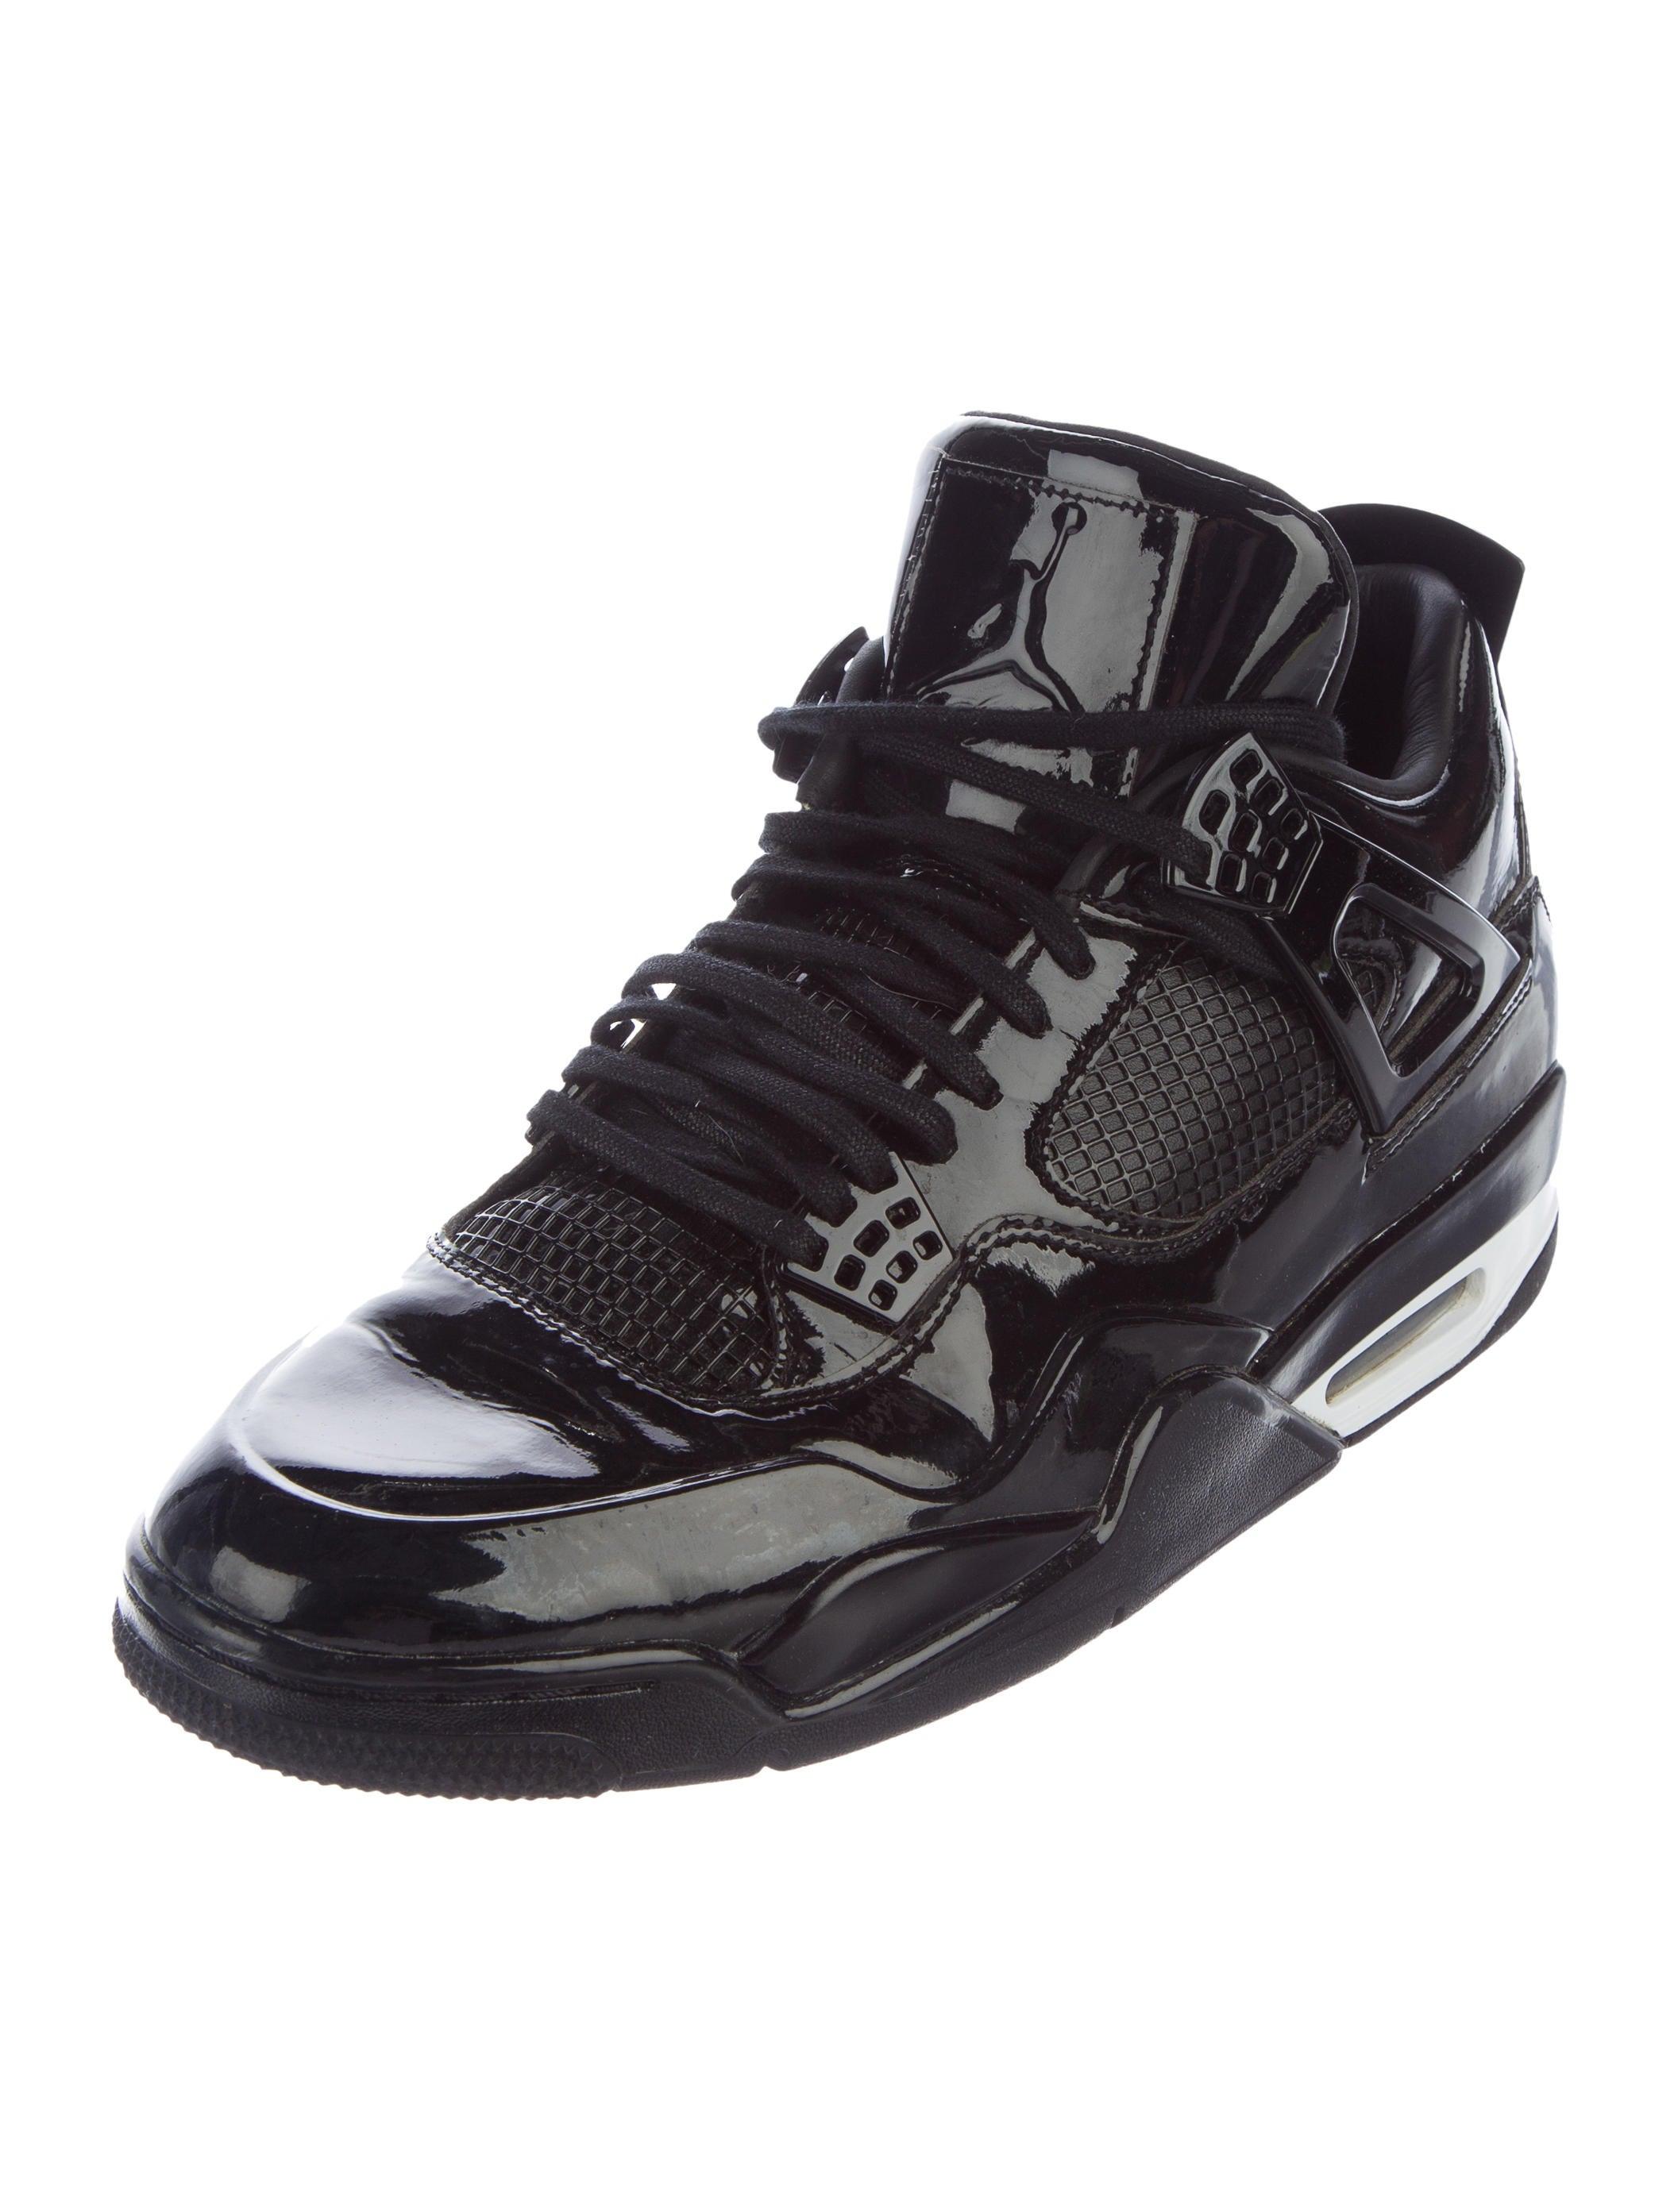 nike air jordan 4 retro 11lab4 sneakers shoes wniaj20287 the realreal. Black Bedroom Furniture Sets. Home Design Ideas